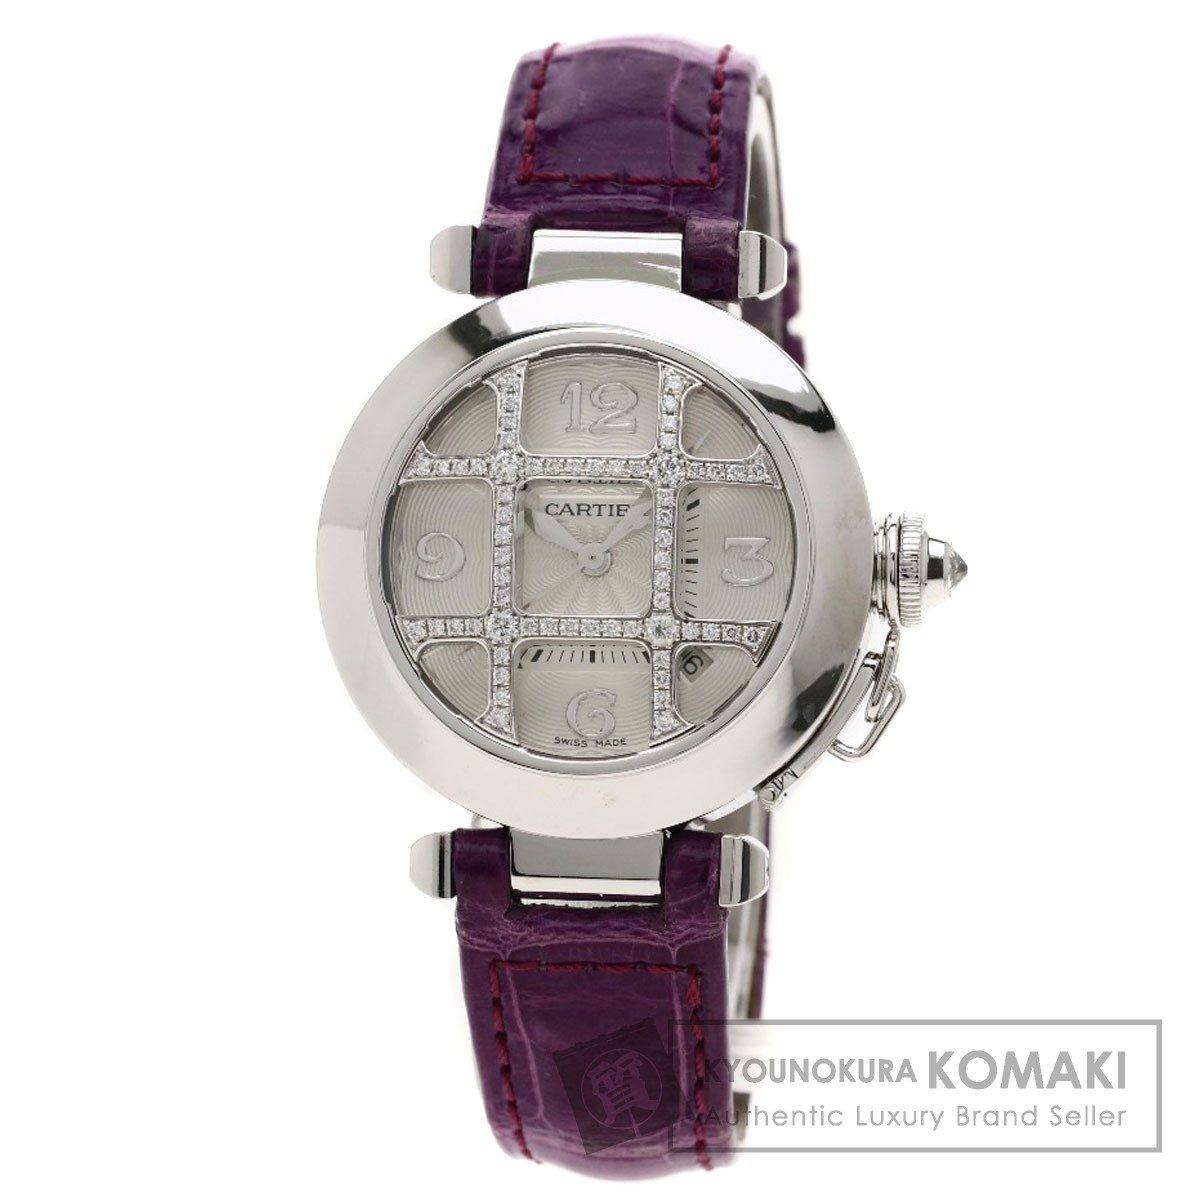 CARTIER パシャ 32mm 腕時計 K18ホワイトゴールド/革 レディース 【中古】【カルティエ】